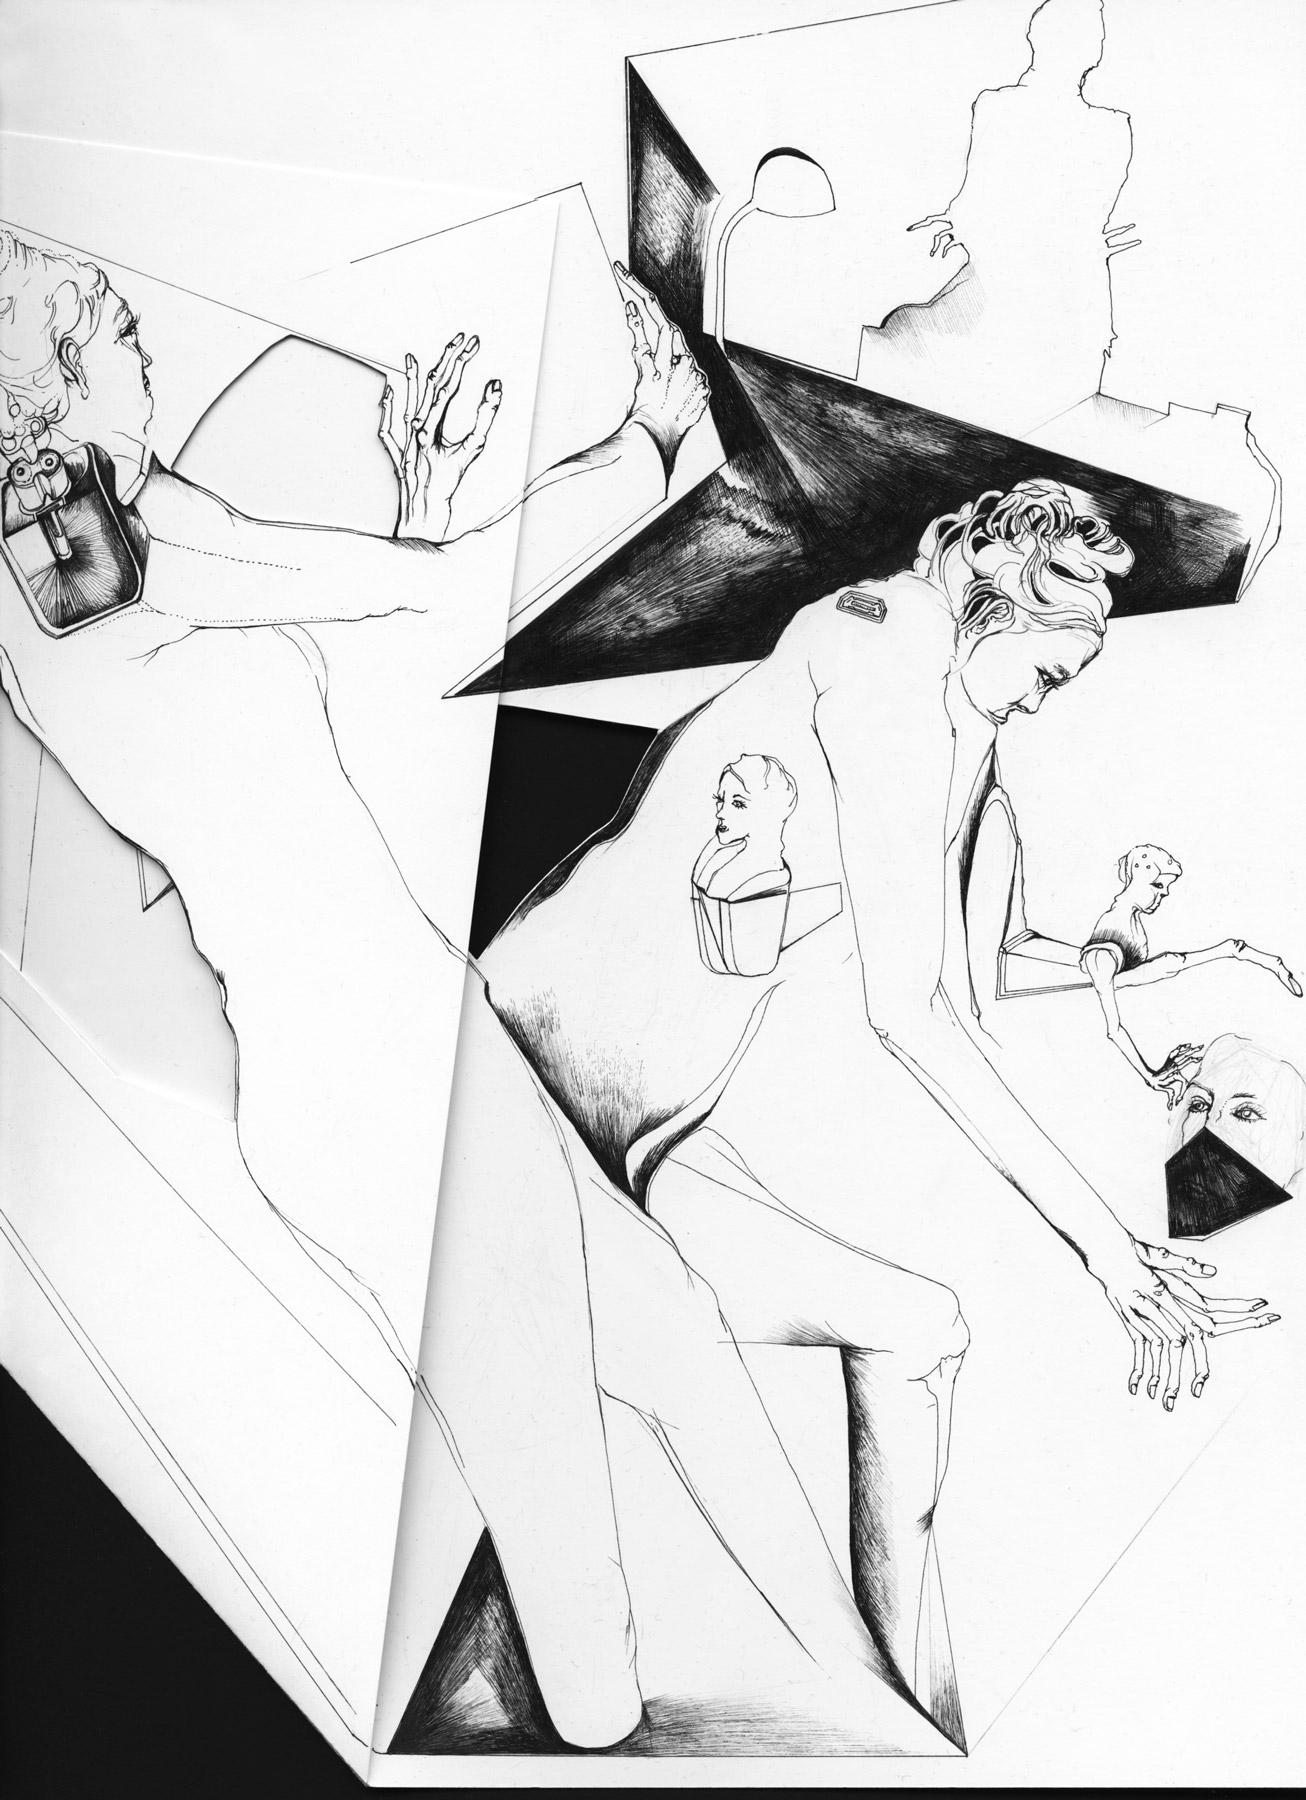 Nina Annabelle Märkl   Inselgruppe bei Kunstlicht   Ink on folded paper, Cut - Outs   Detail   2016